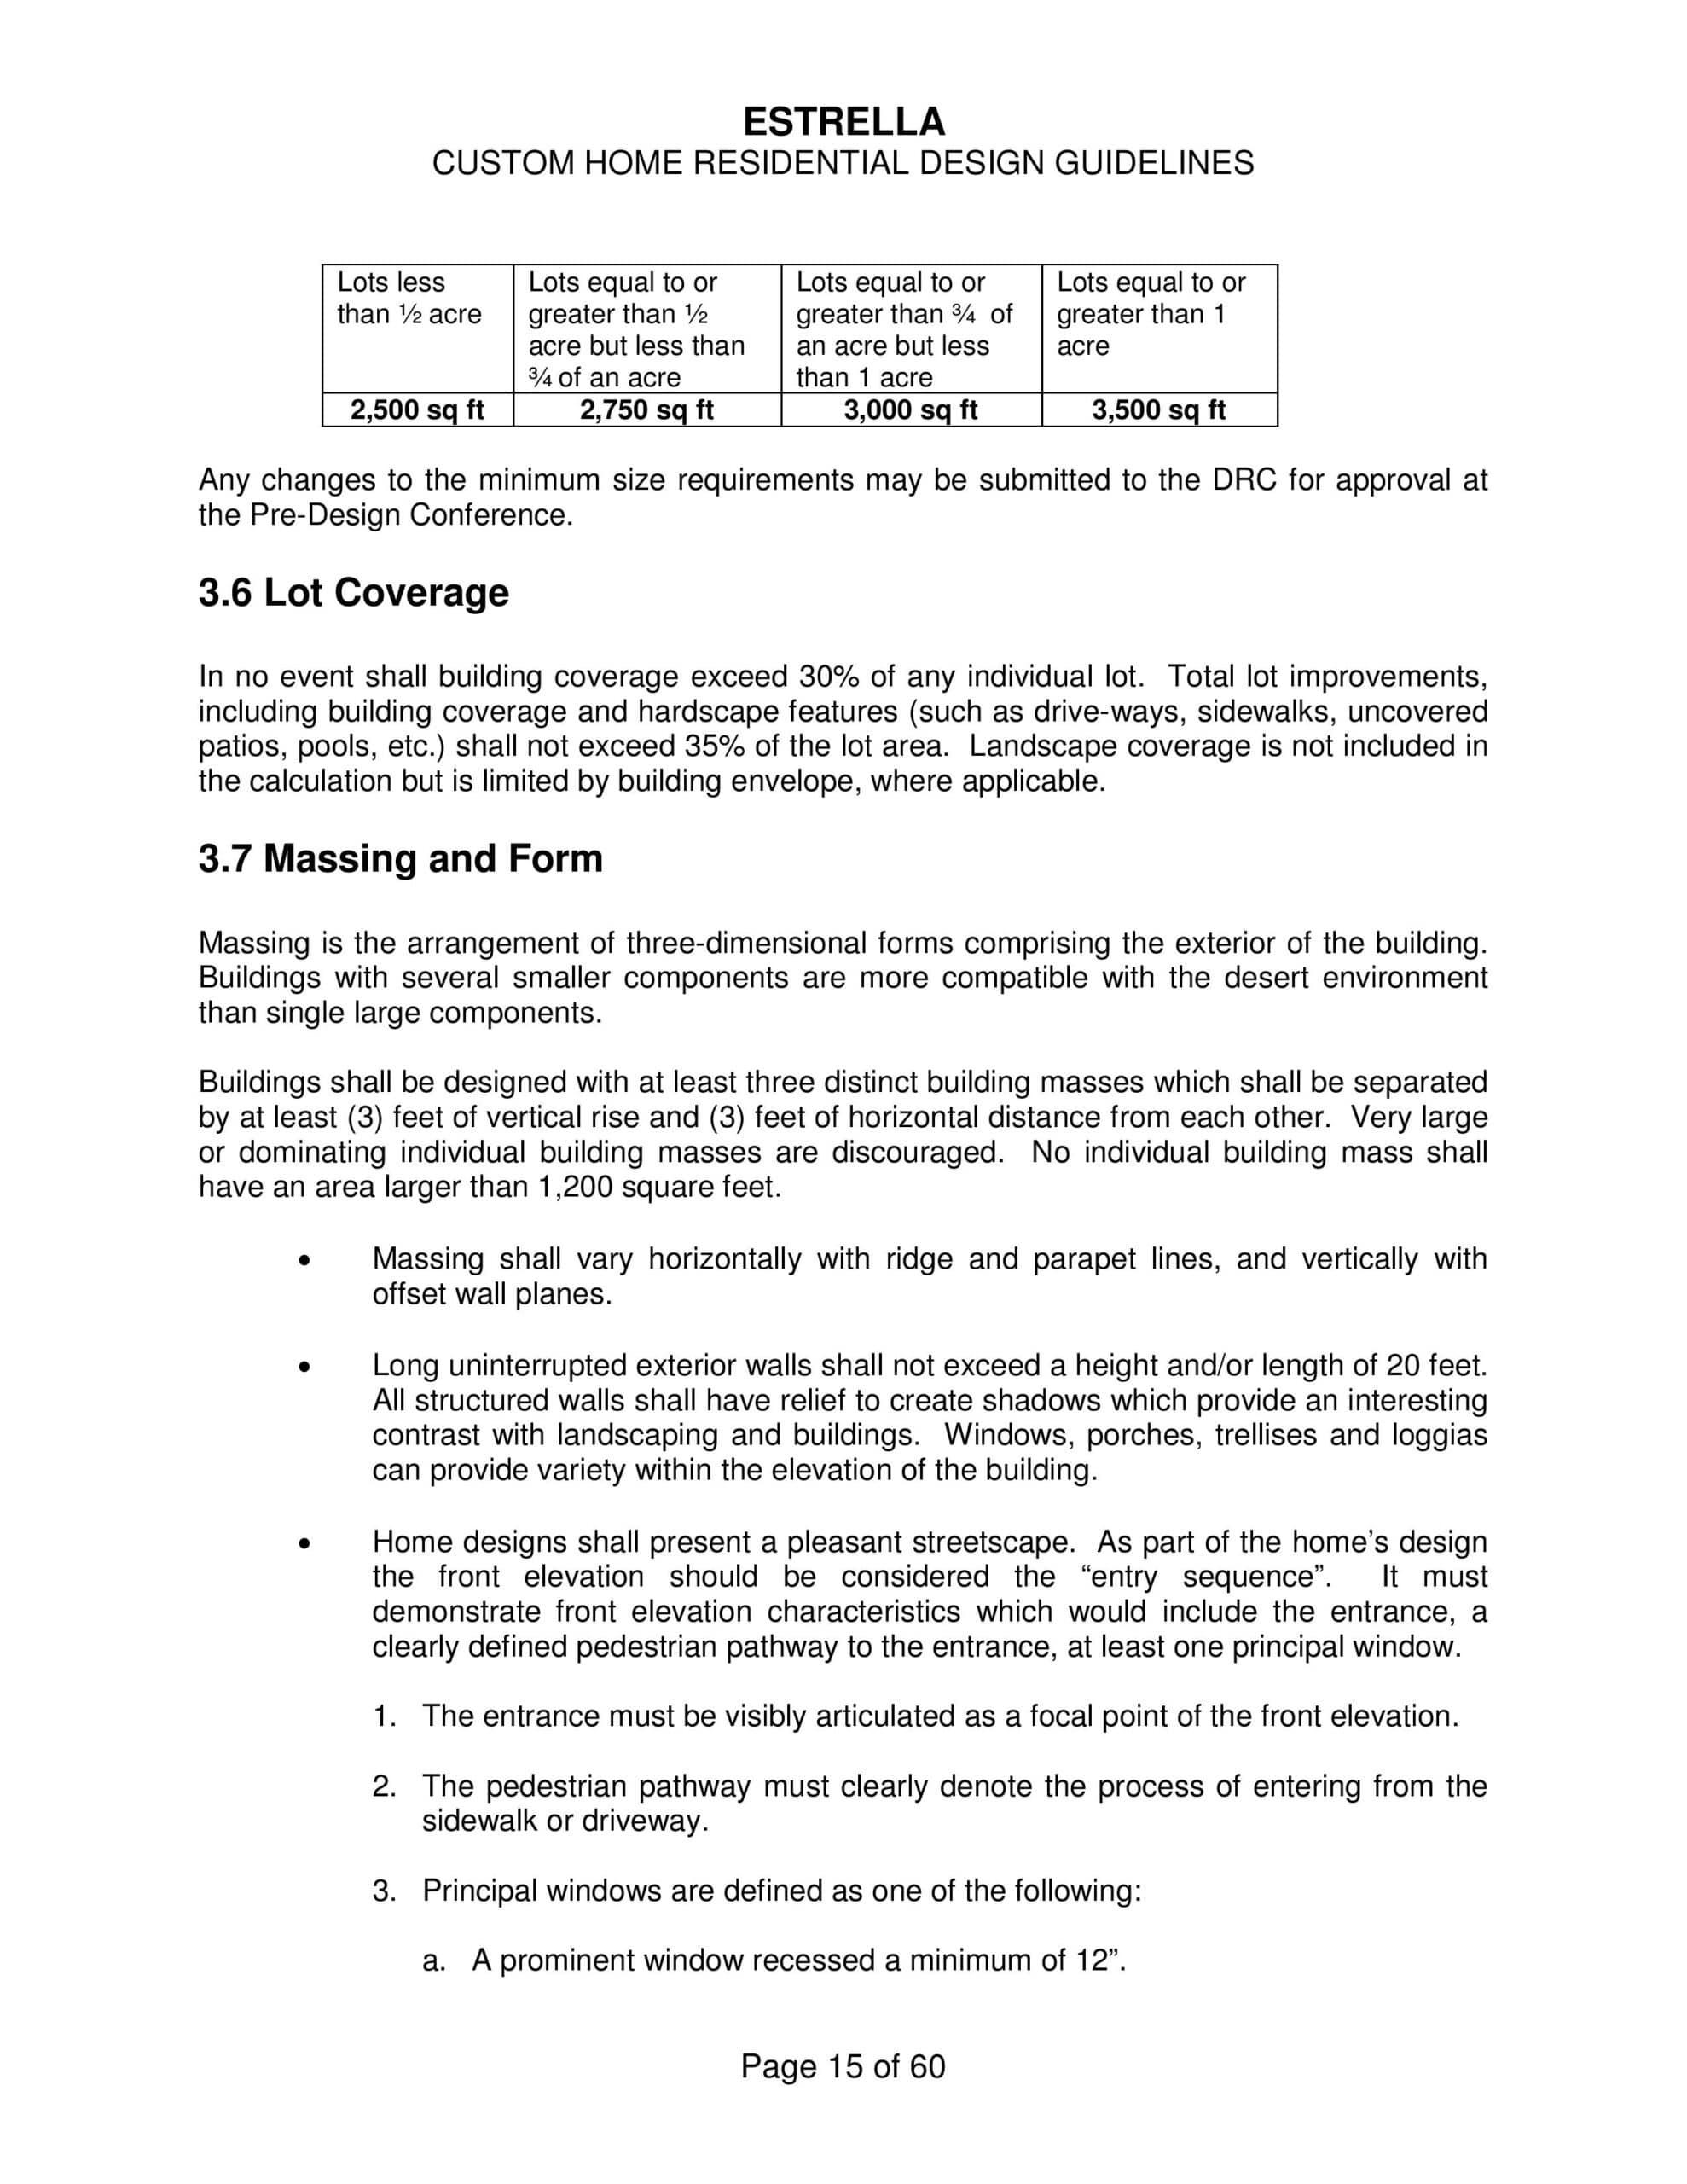 ESTRELLA MOUNTAIN CUSTOM HOME GUIDELINES-page-019